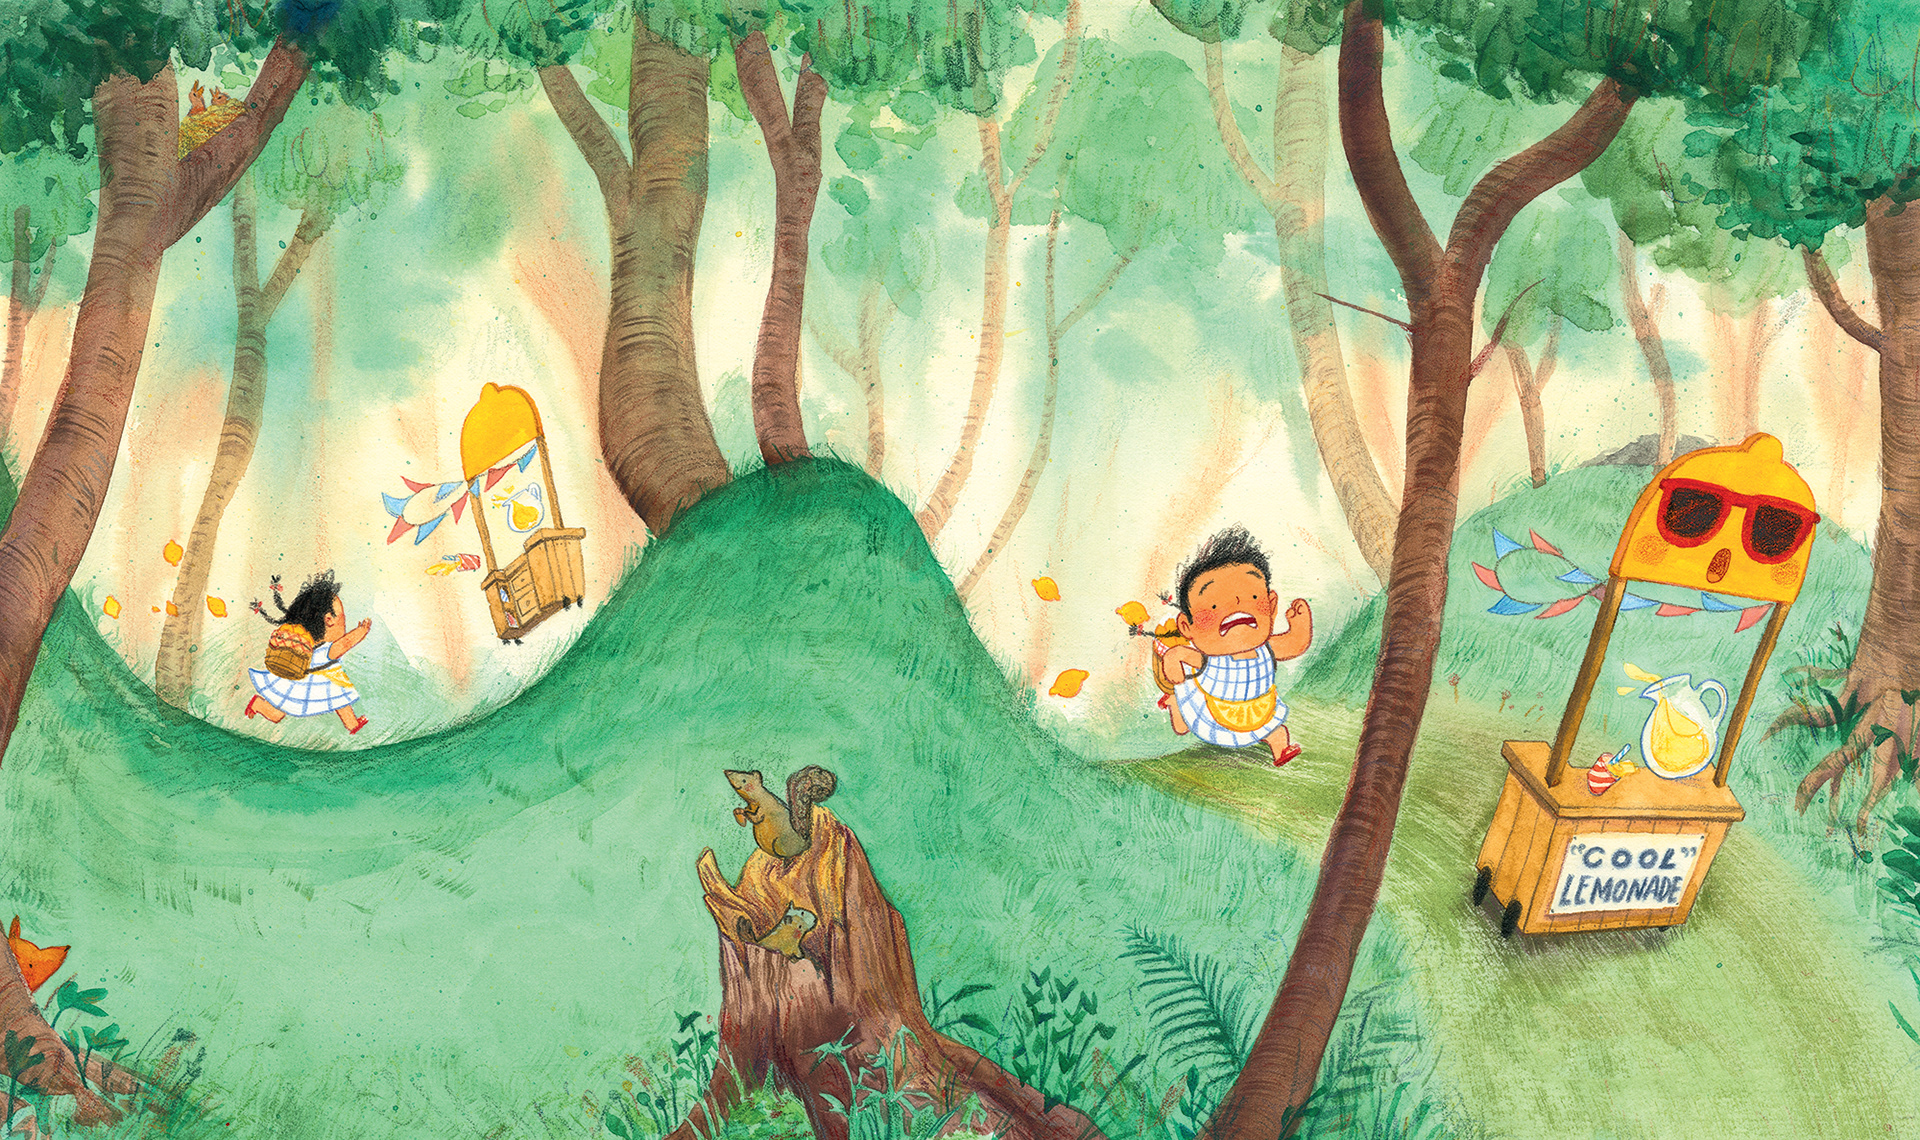 Gideon Sterer on Encouraging Kids to Find Wonder in Nature